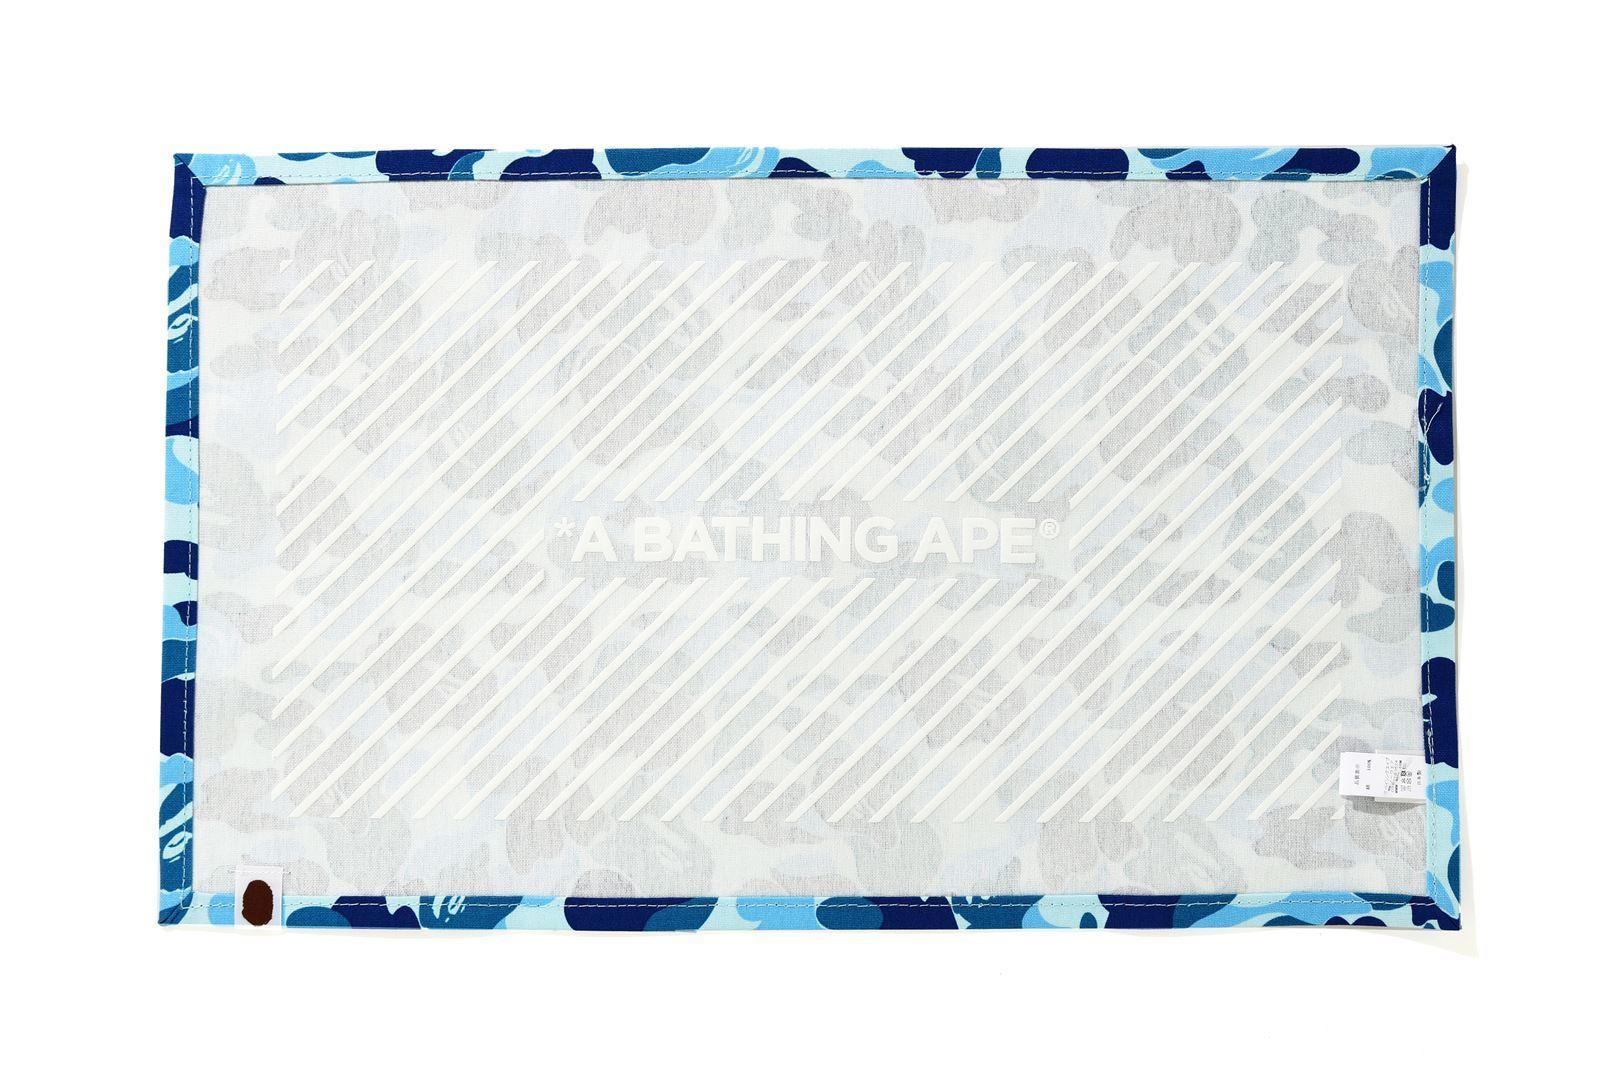 A BATHING APE® TABLEWARE_a0174495_17300437.jpg